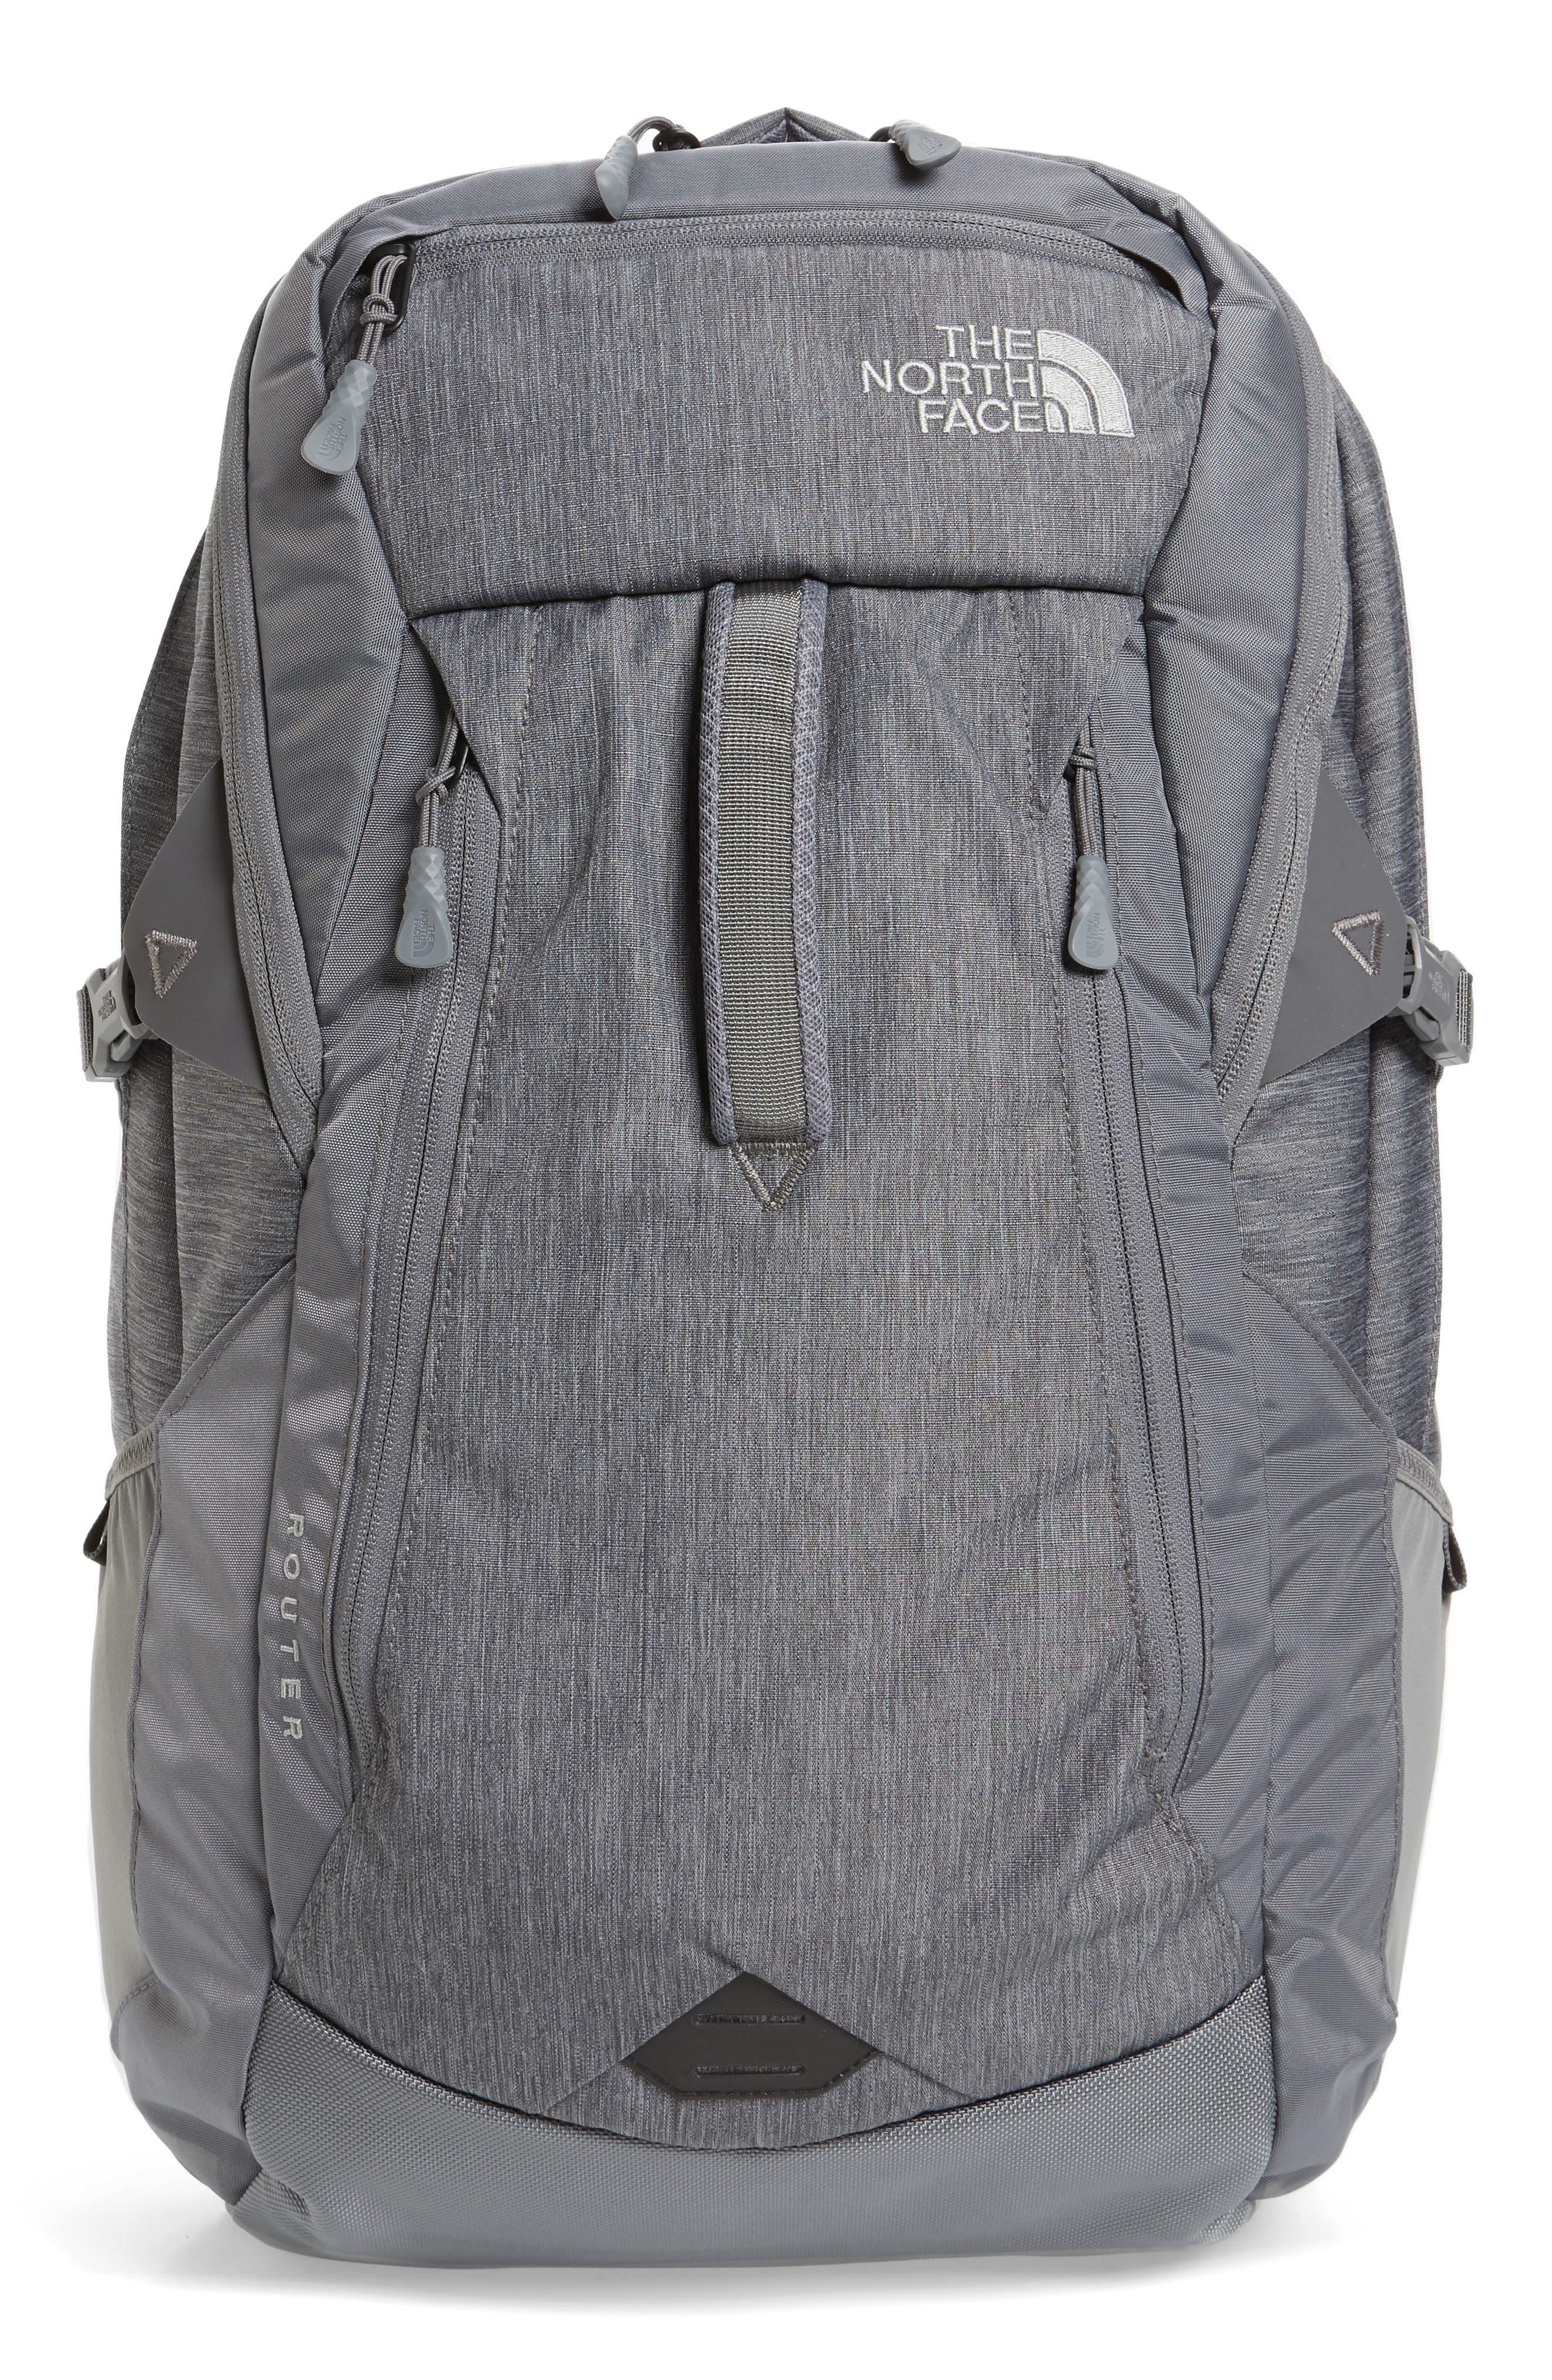 Router Backpack,                         Main,                         color, Medium Grey Heather/ Zinc Grey